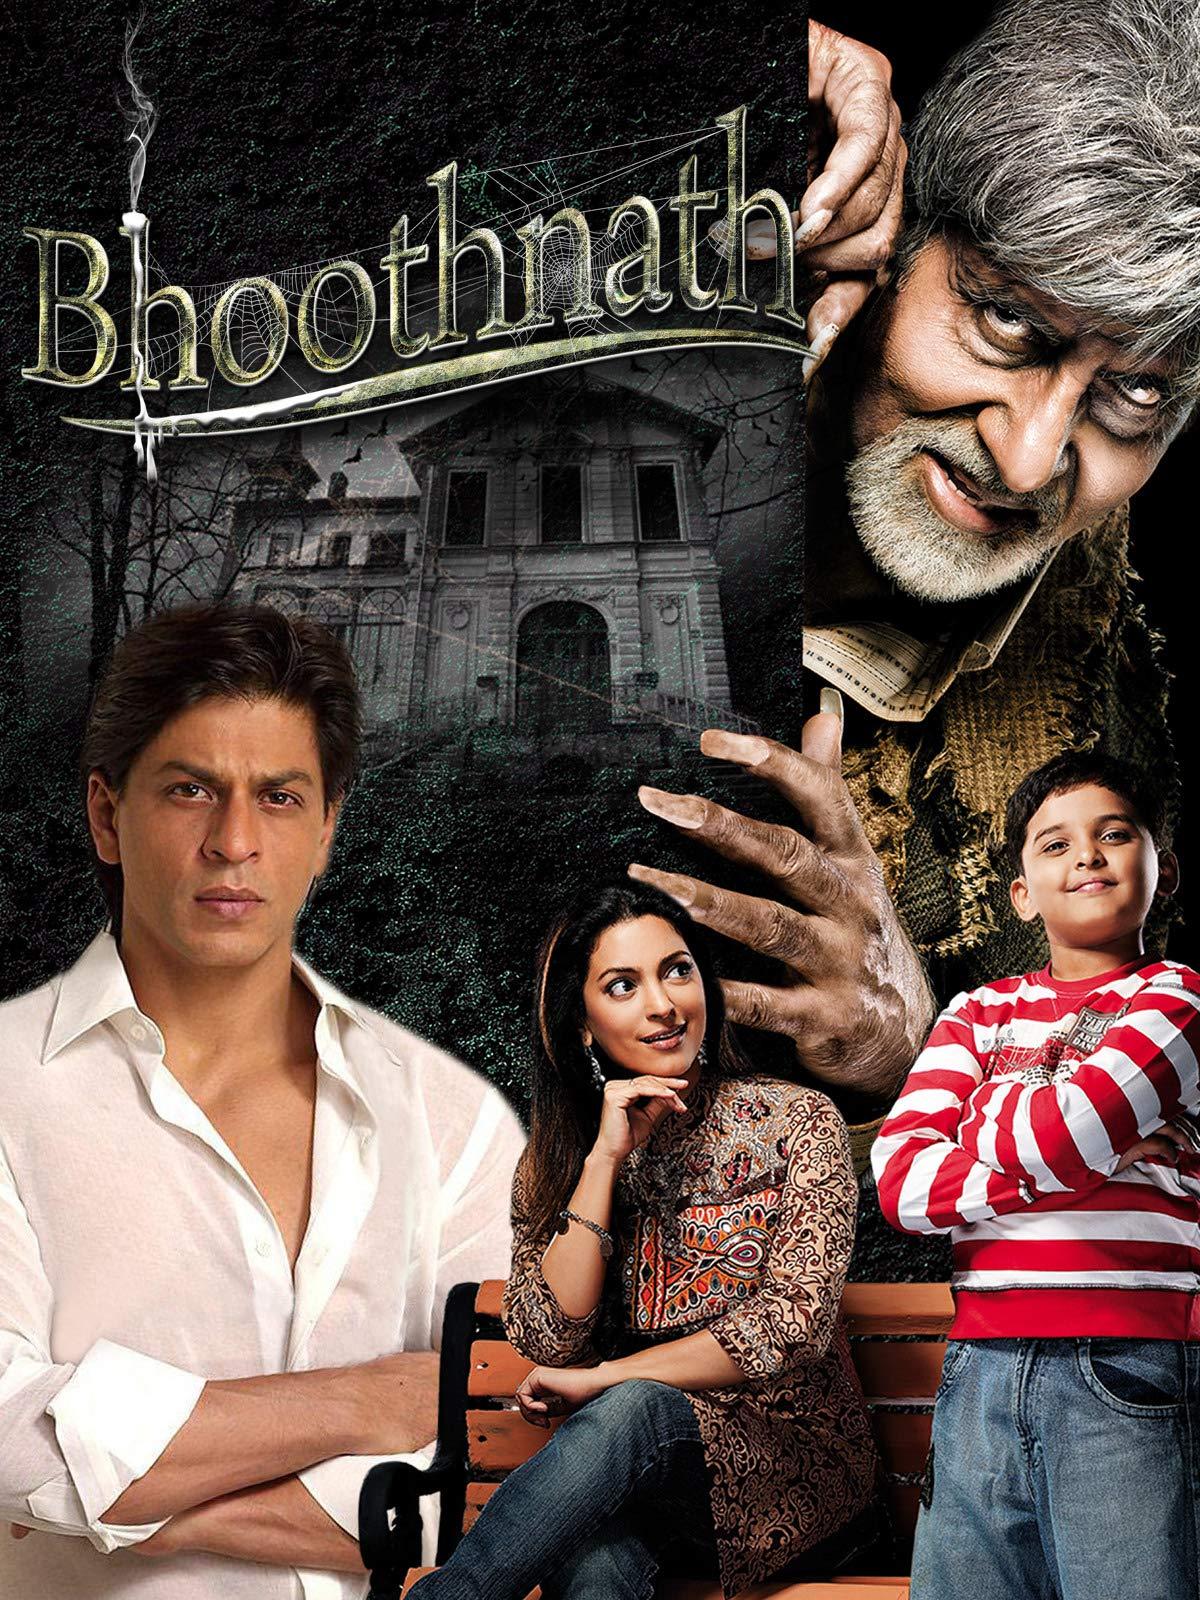 Watch Bhoothnath | Prime Video